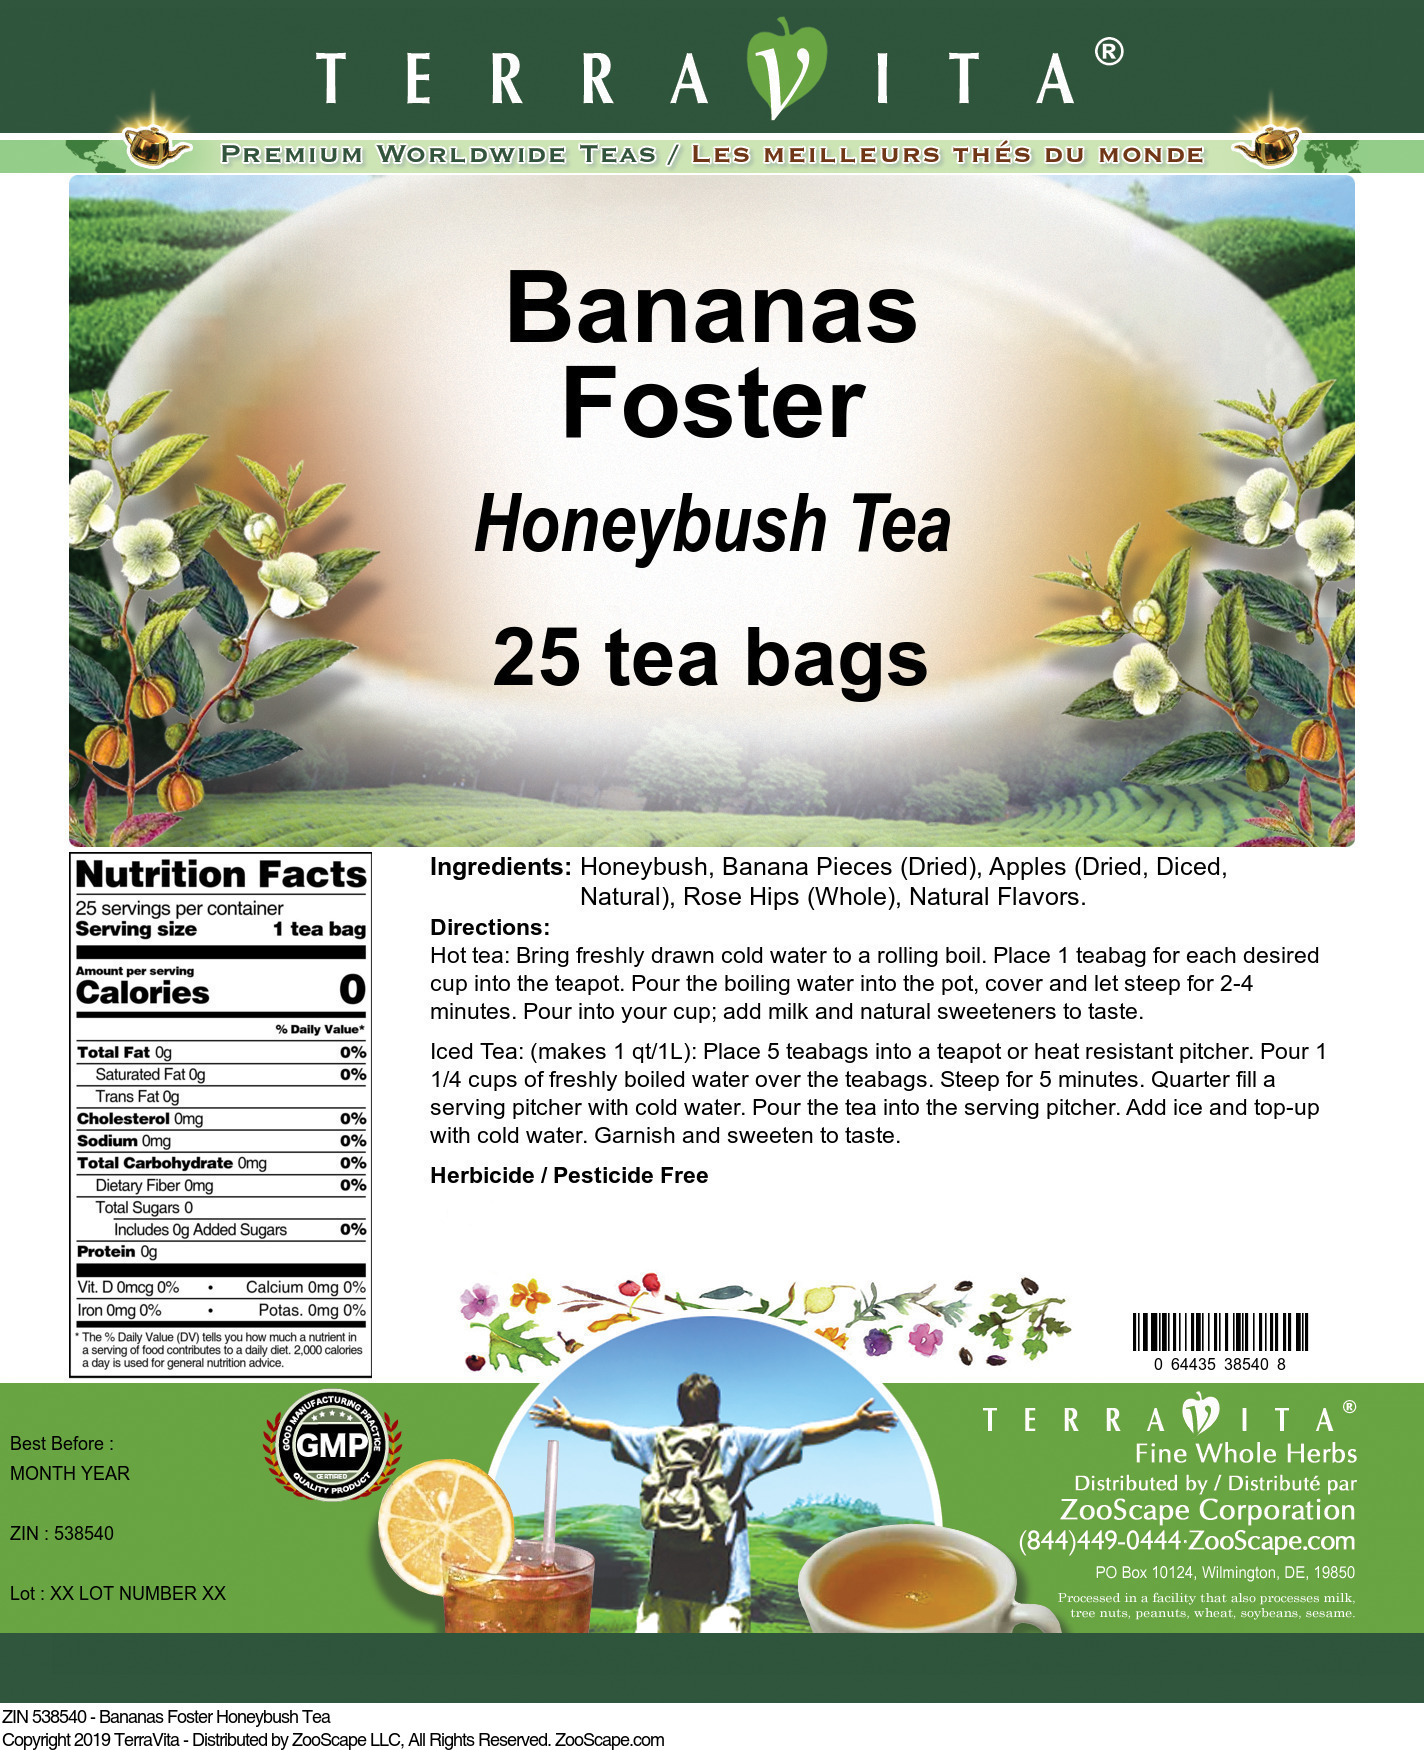 Banana Foster Honeybush Tea